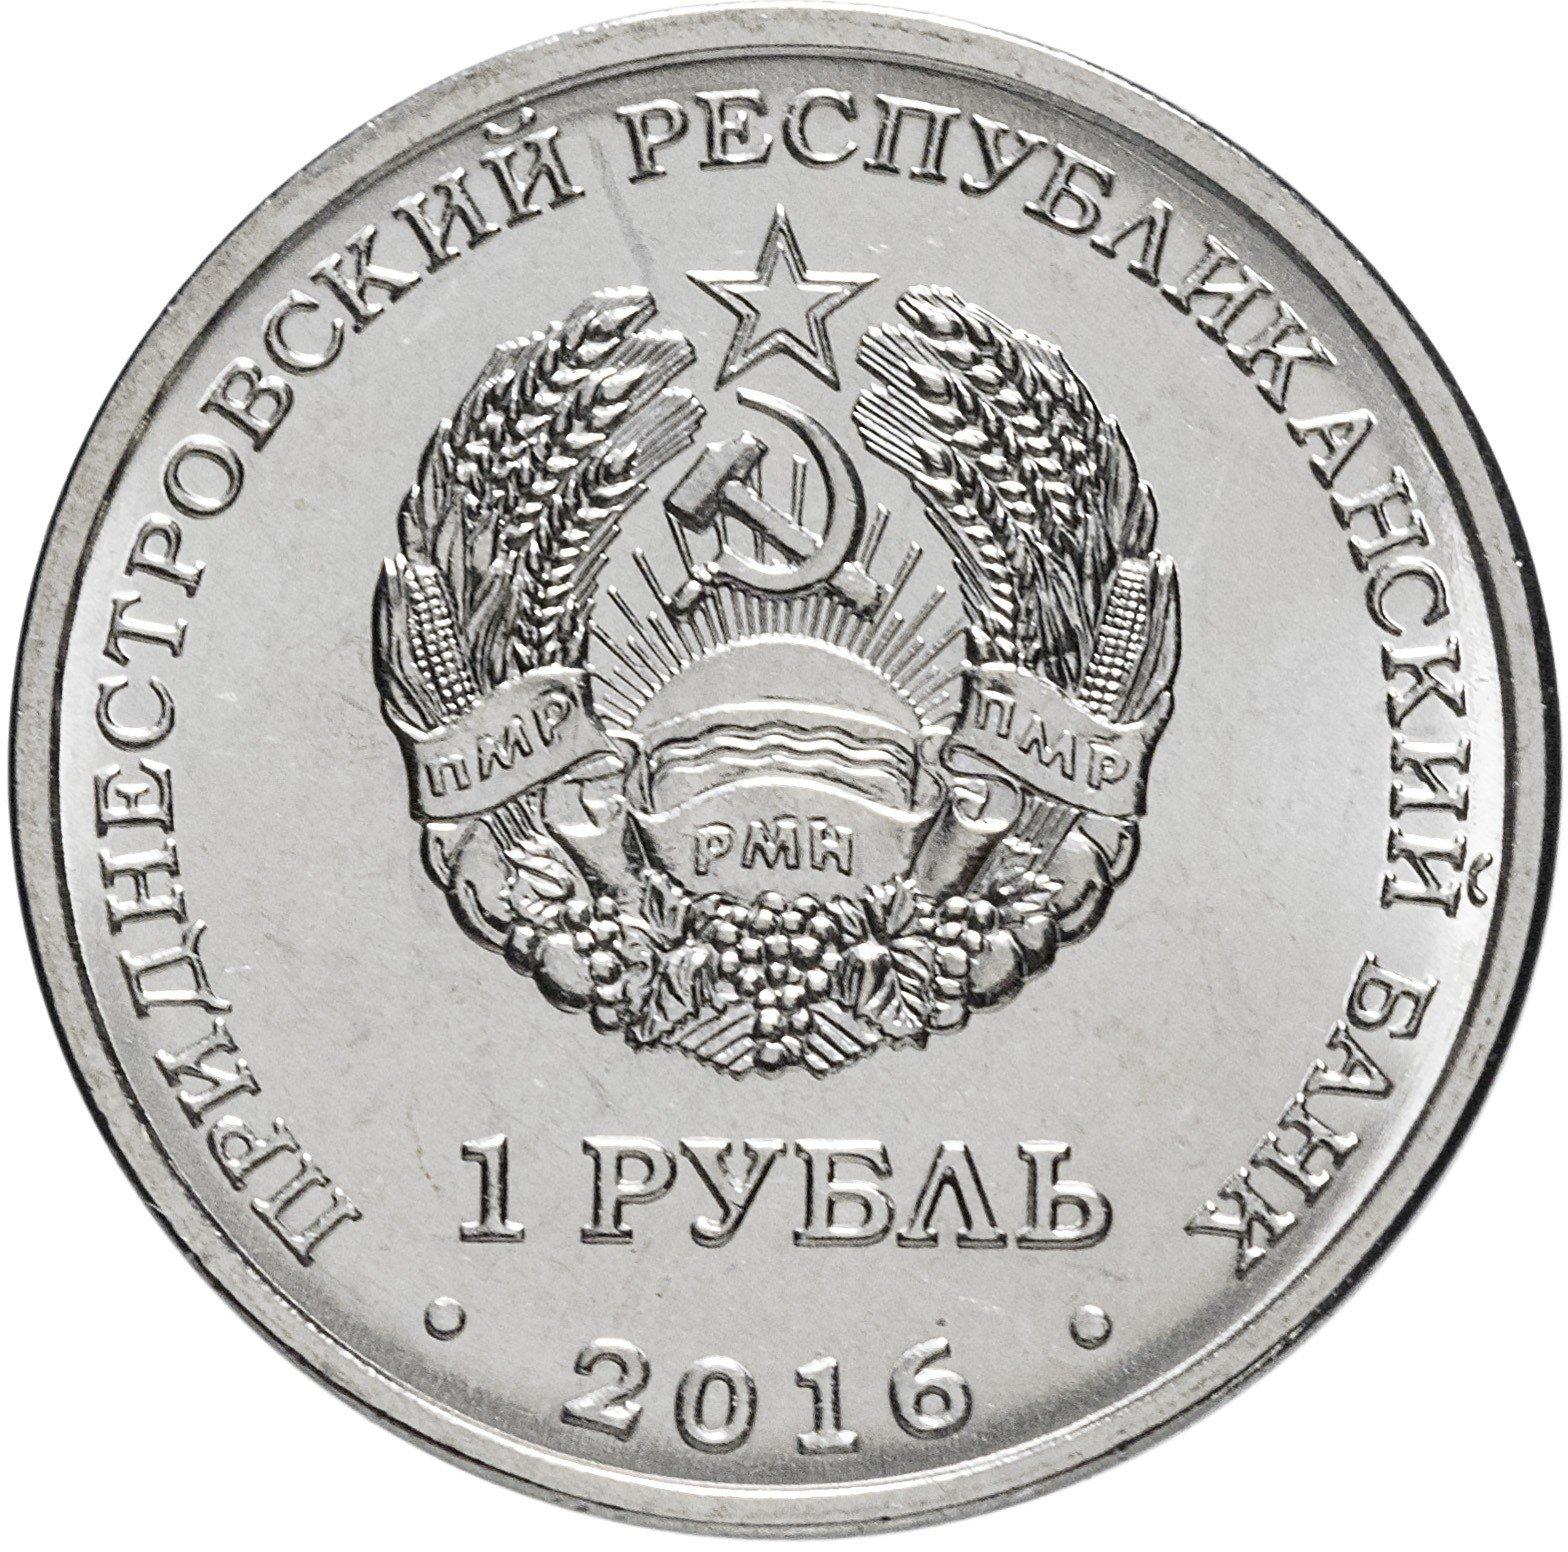 Купить скорпион г за 1 рубль где можно купить голду за 150 на 50 000 голды